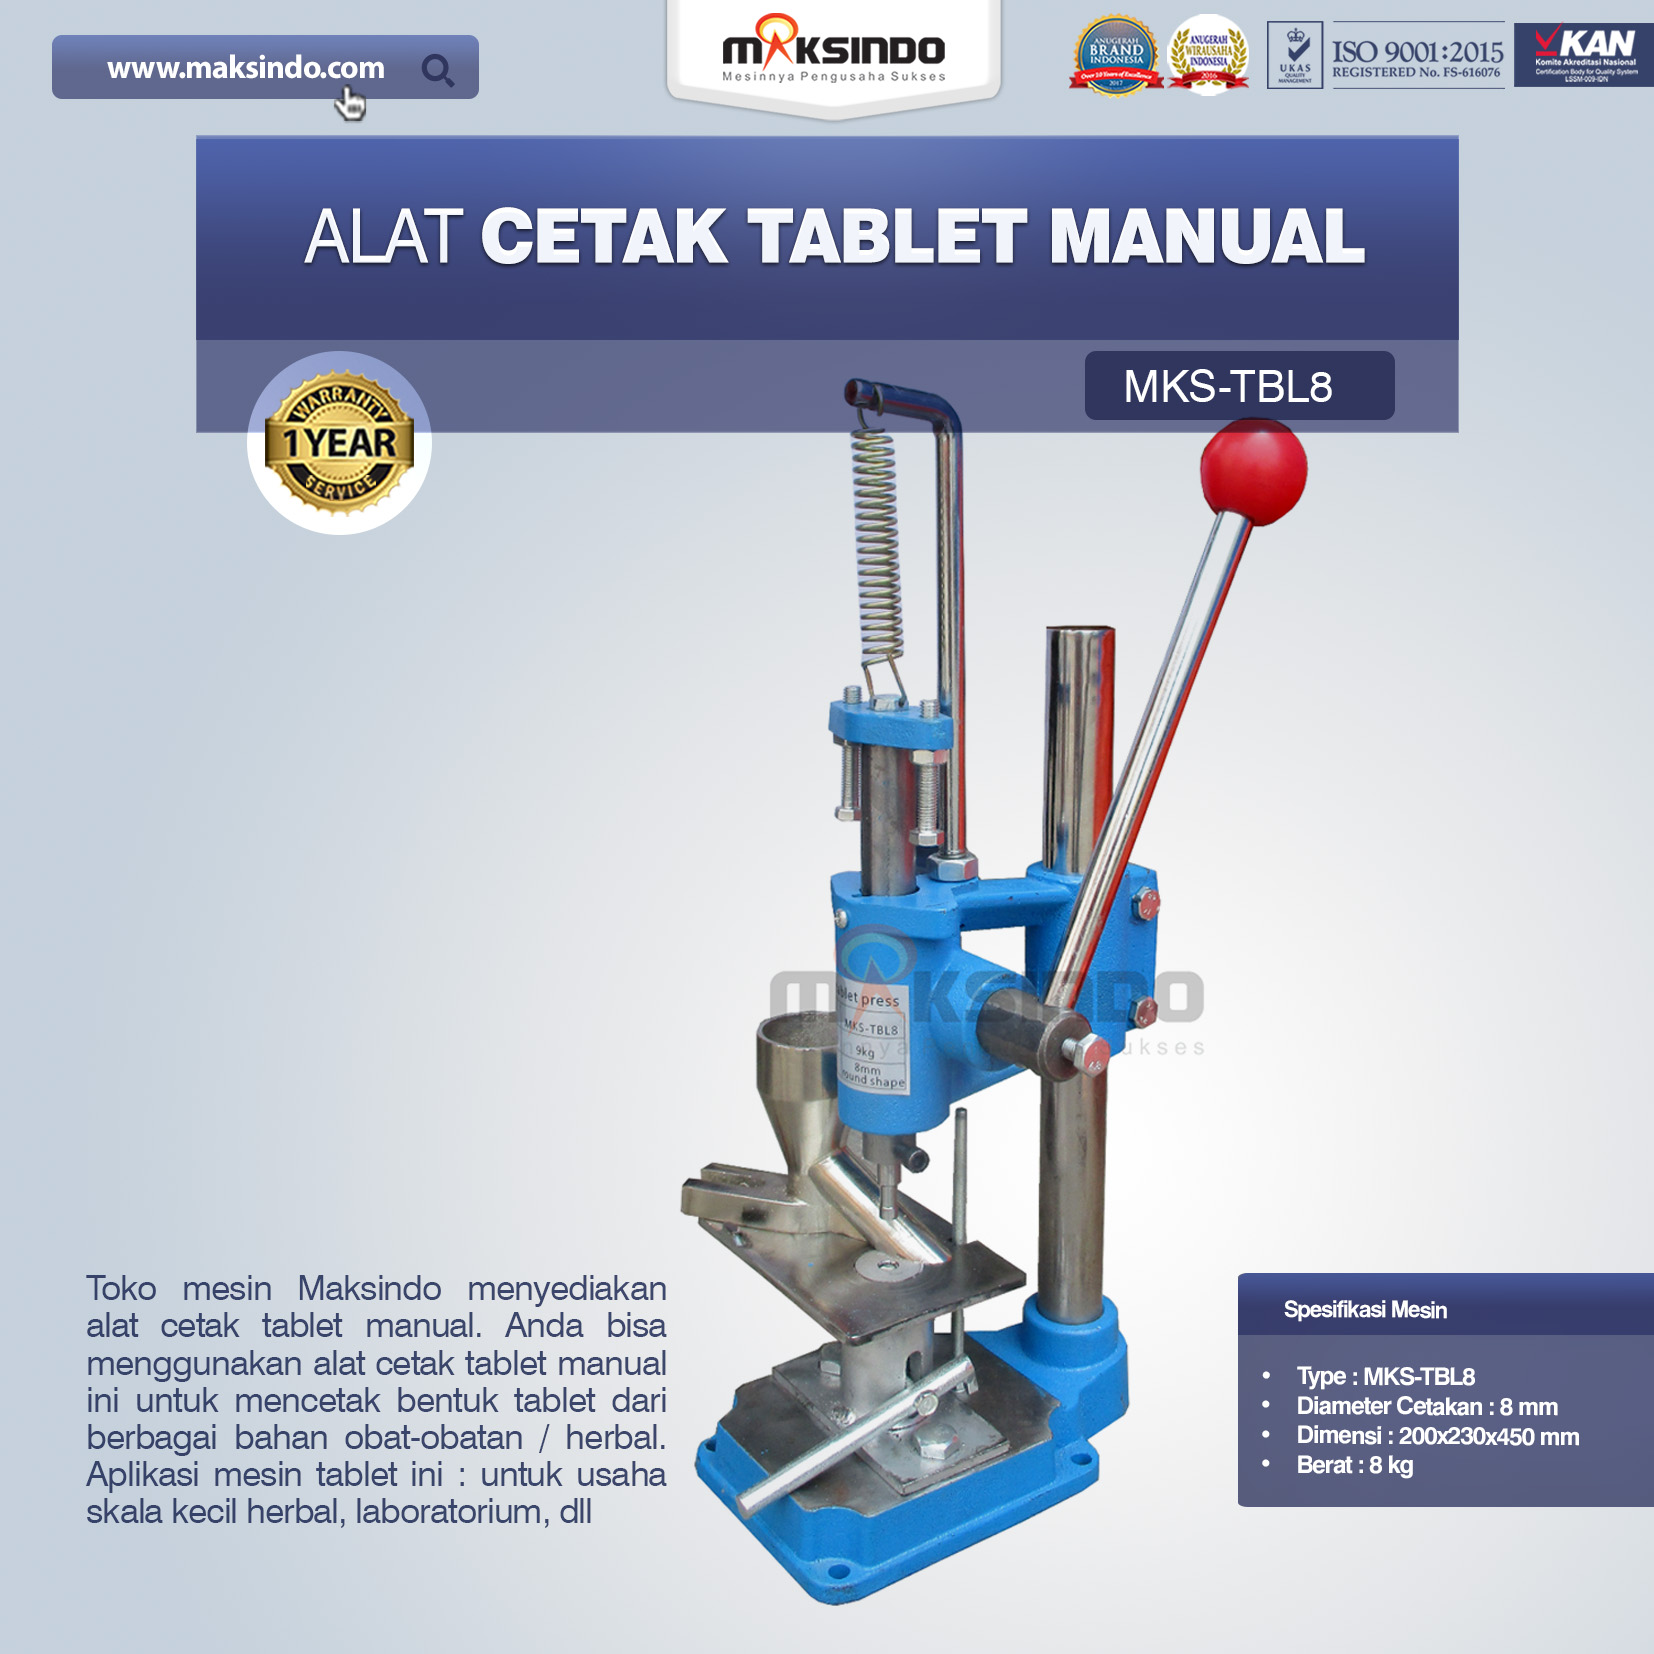 Alat Cetak Tablet Manual MKS-TBL8